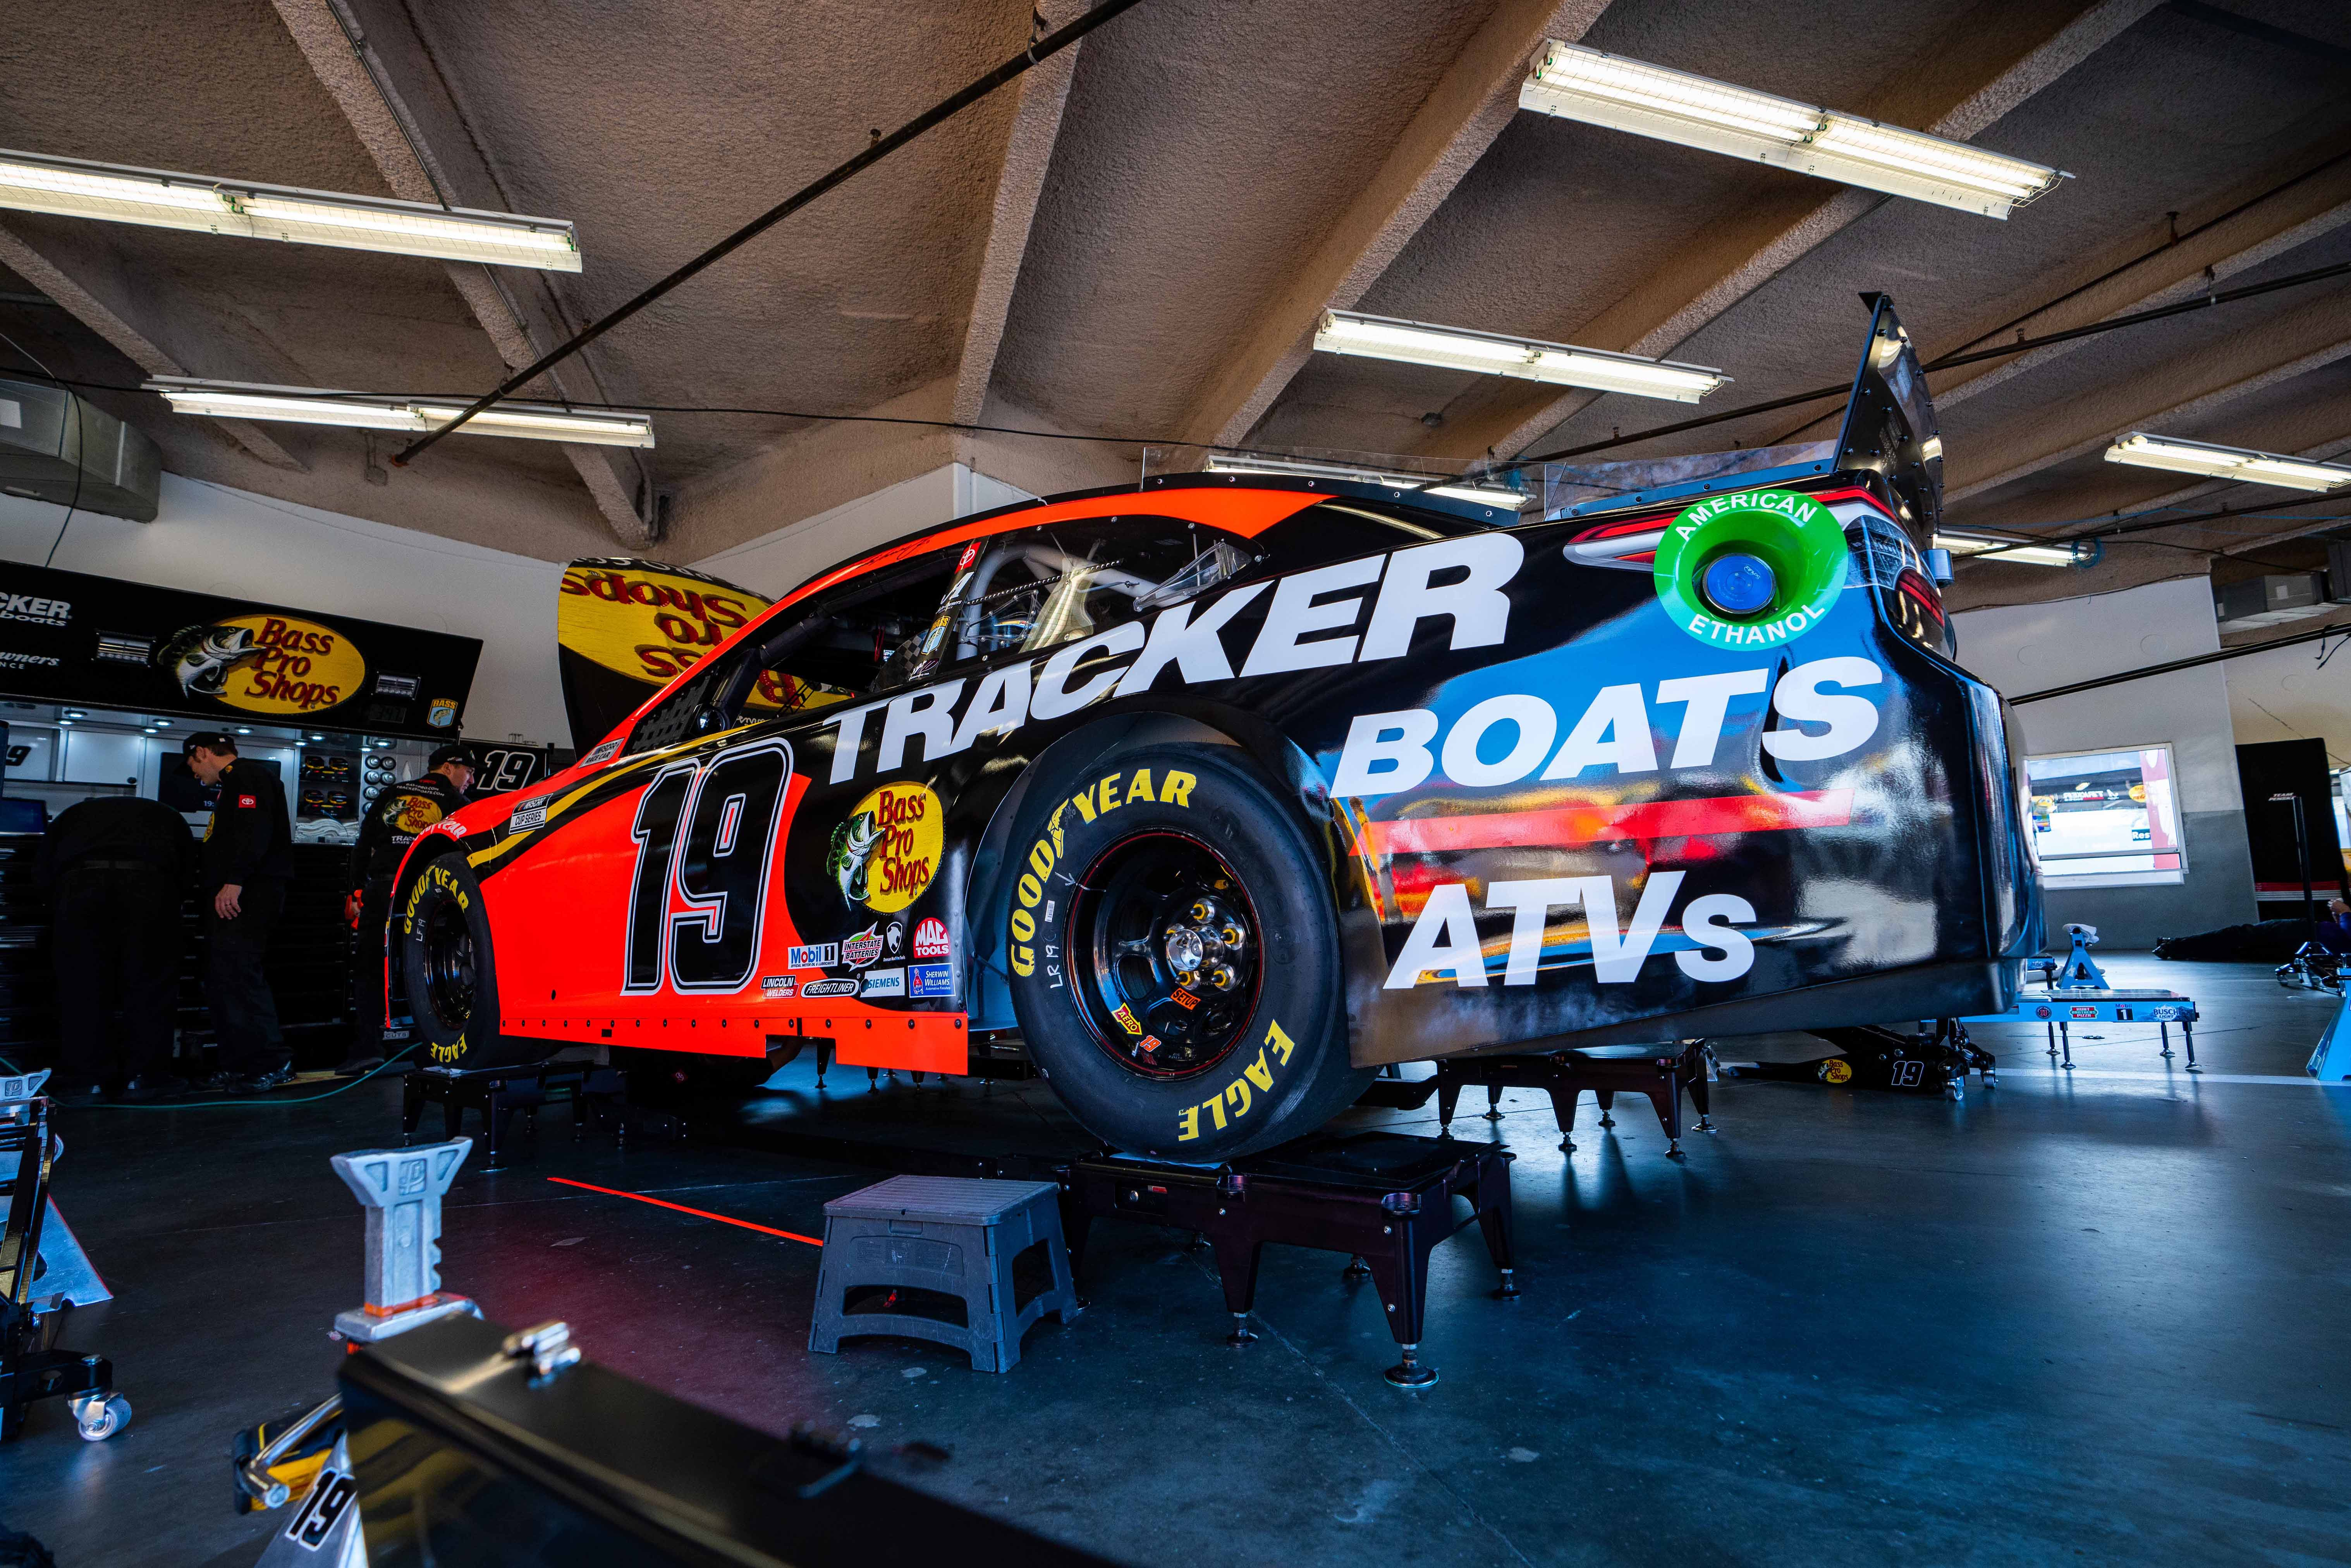 Martin Truex Jr in the NASCAR garage area at Daytona